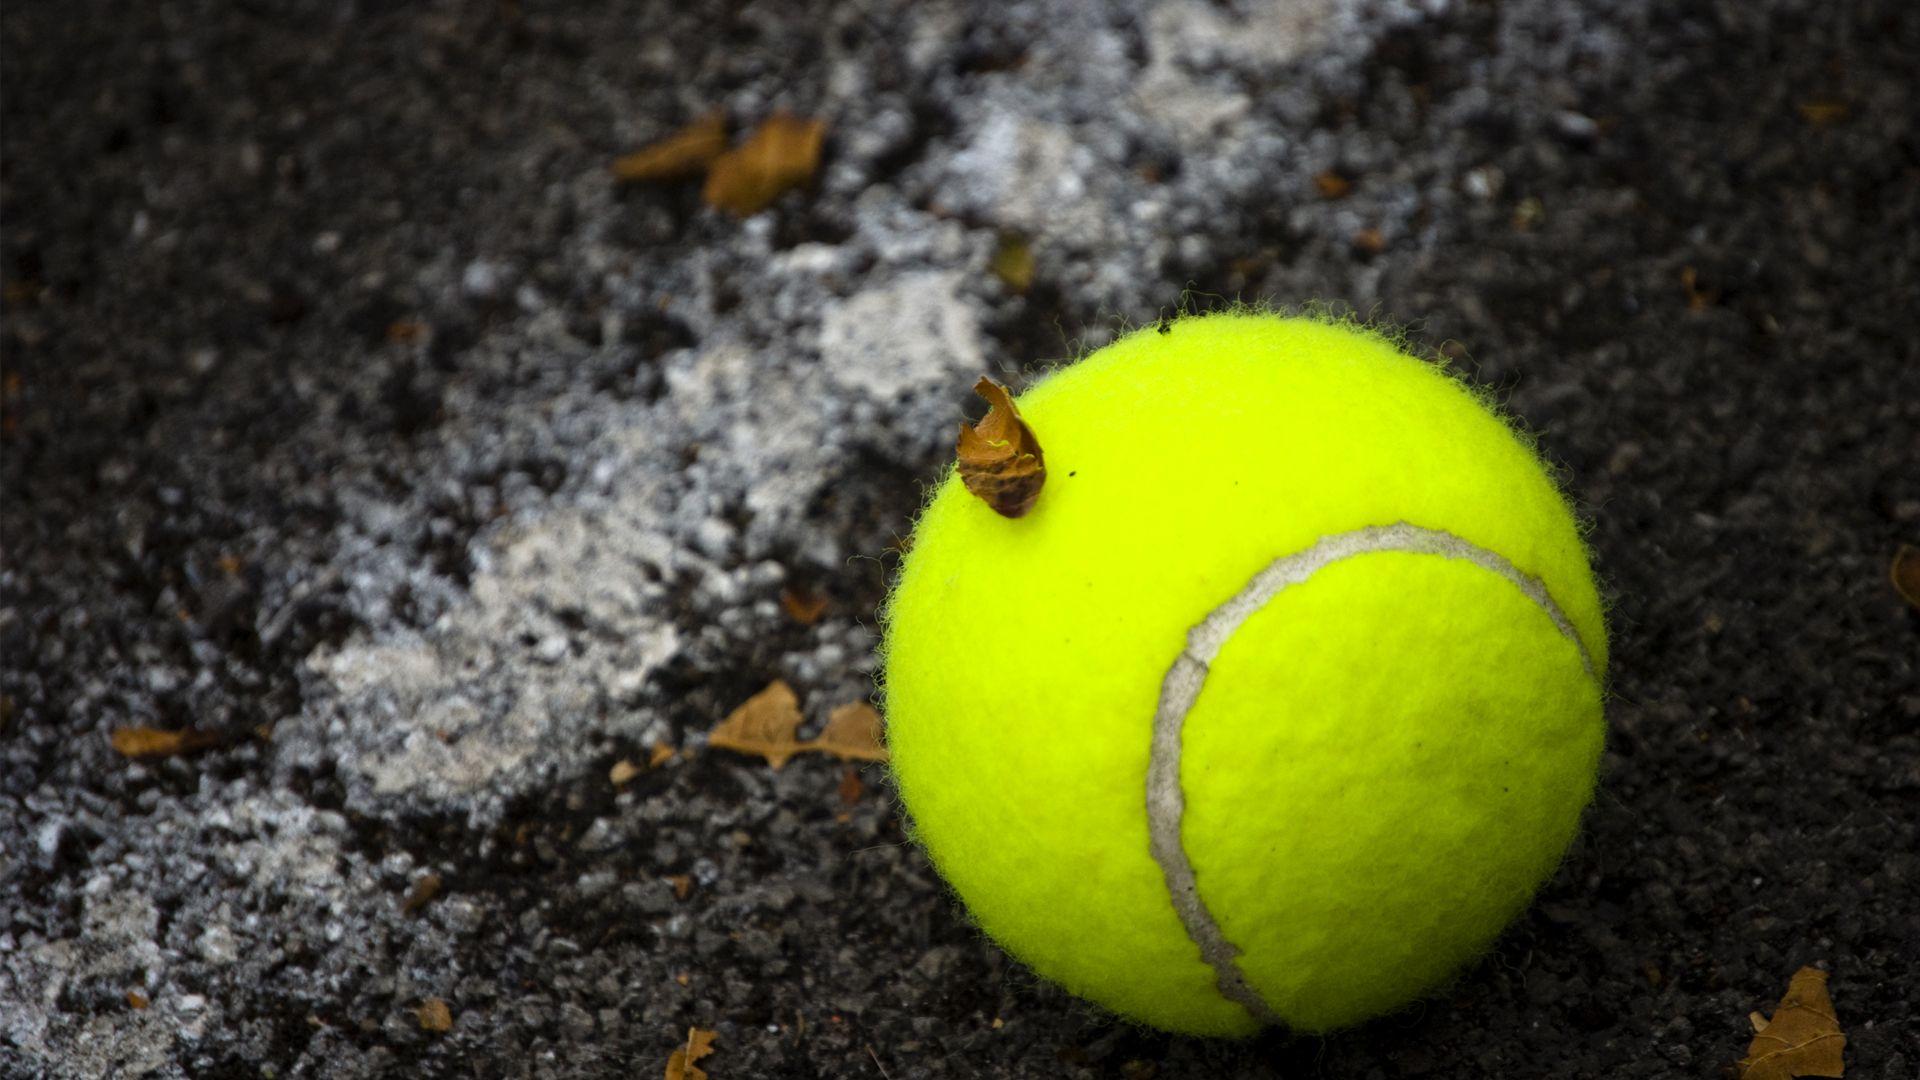 Pin By Sardar Zubair On Zukunftige Projekte Tennis Wallpaper Tennis Ball Tennis Lessons